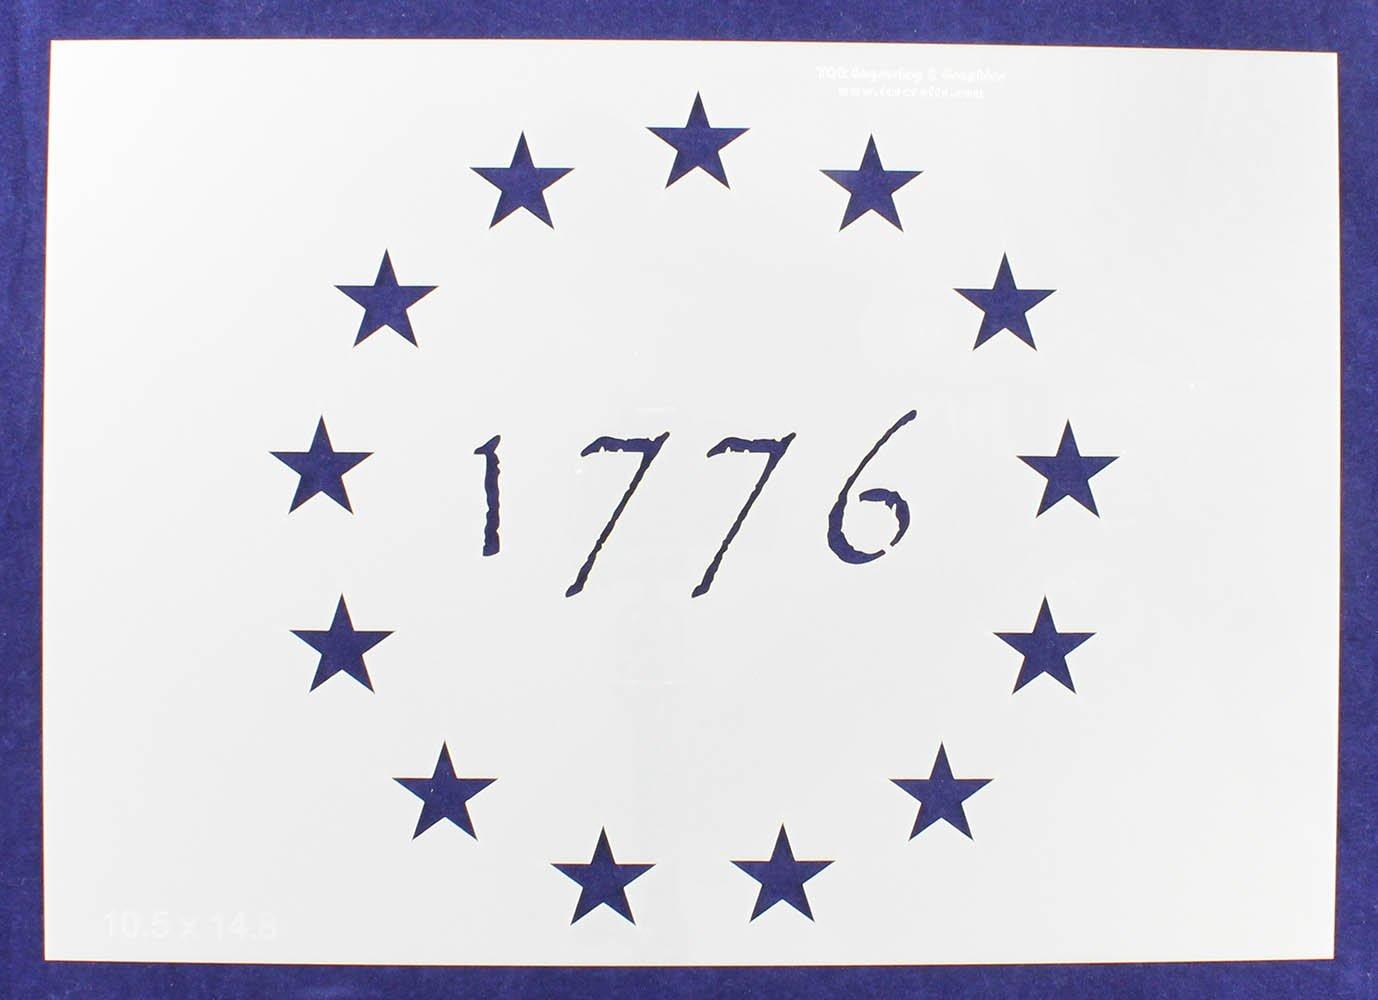 13 Star Revolutionary Field (1776) Stencil 14 Mil -10.5